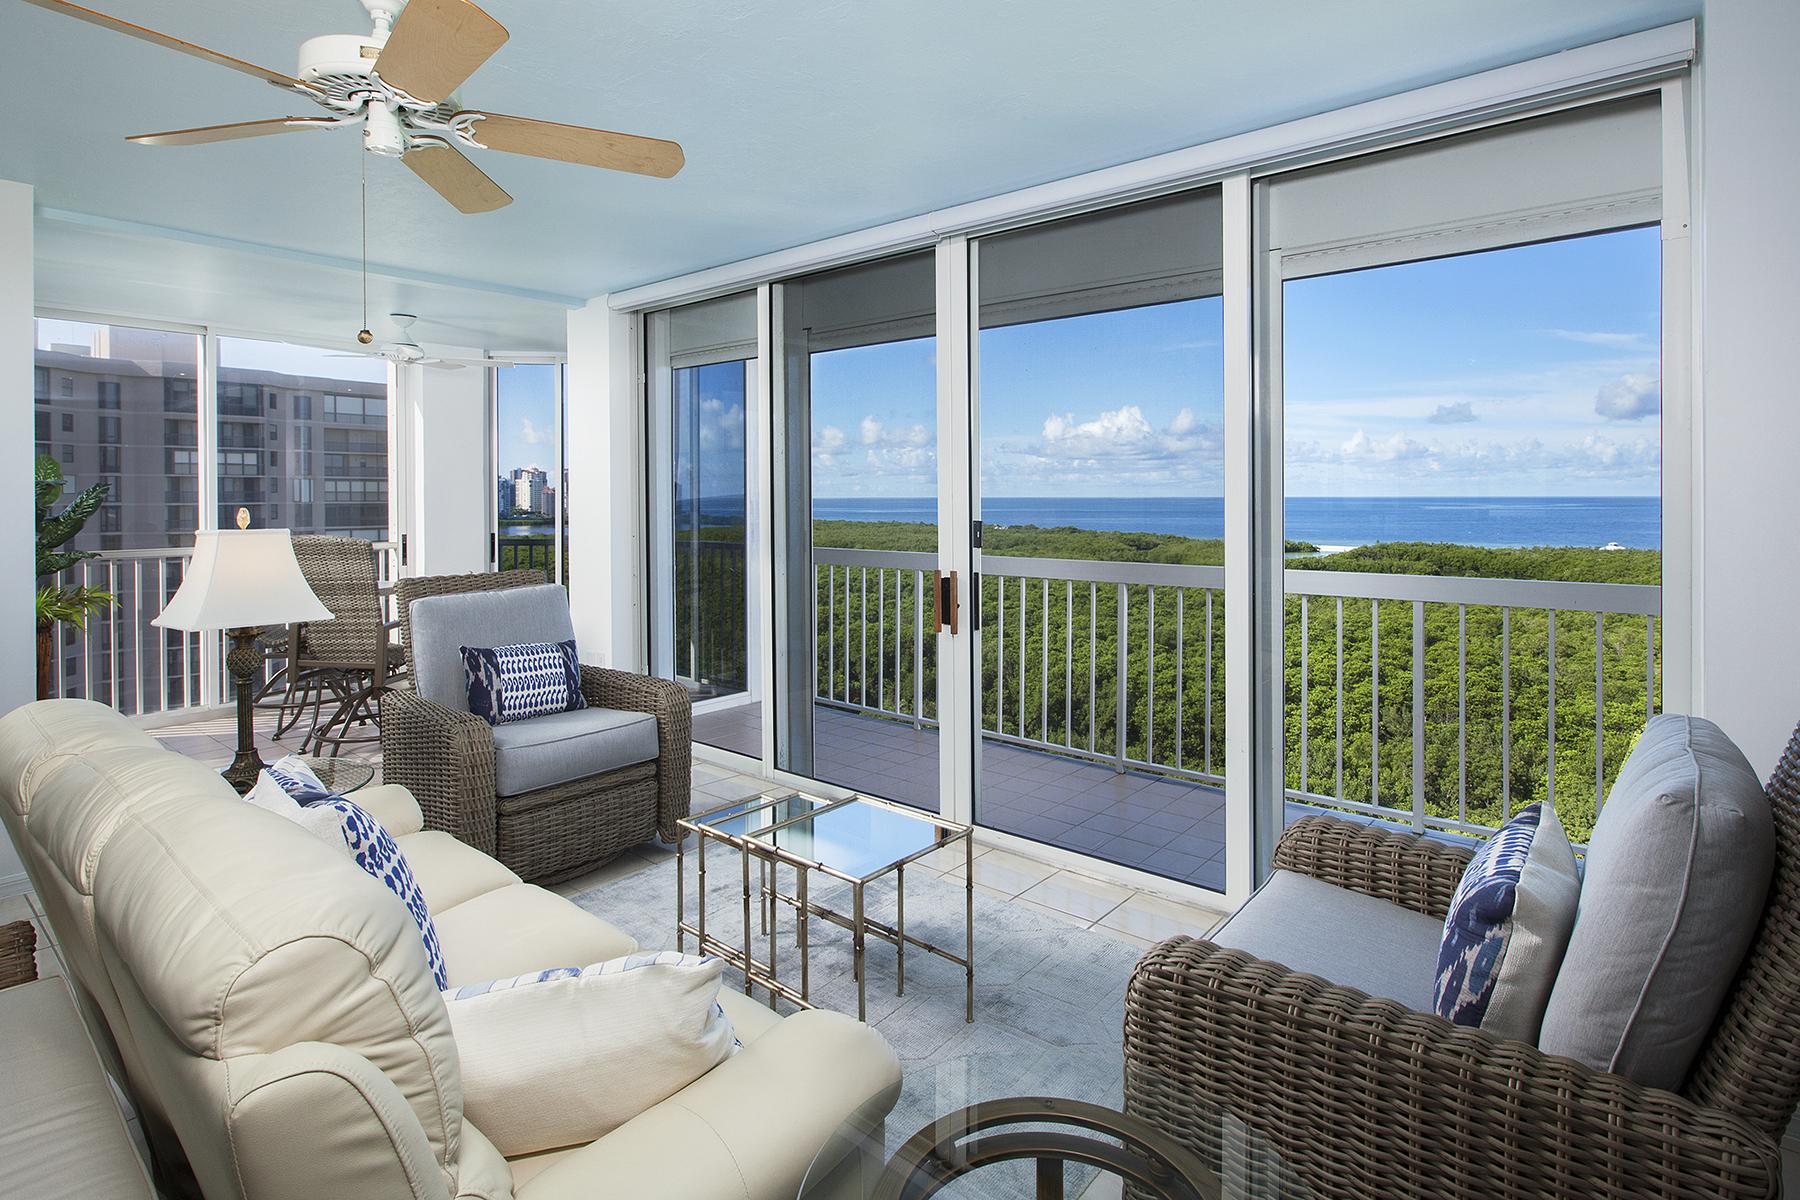 Condominium for Sale at PELICAN BAY - ST. MAARTEN 6101 Pelican Bay Blvd 1104 Naples, Florida, 34108 United States